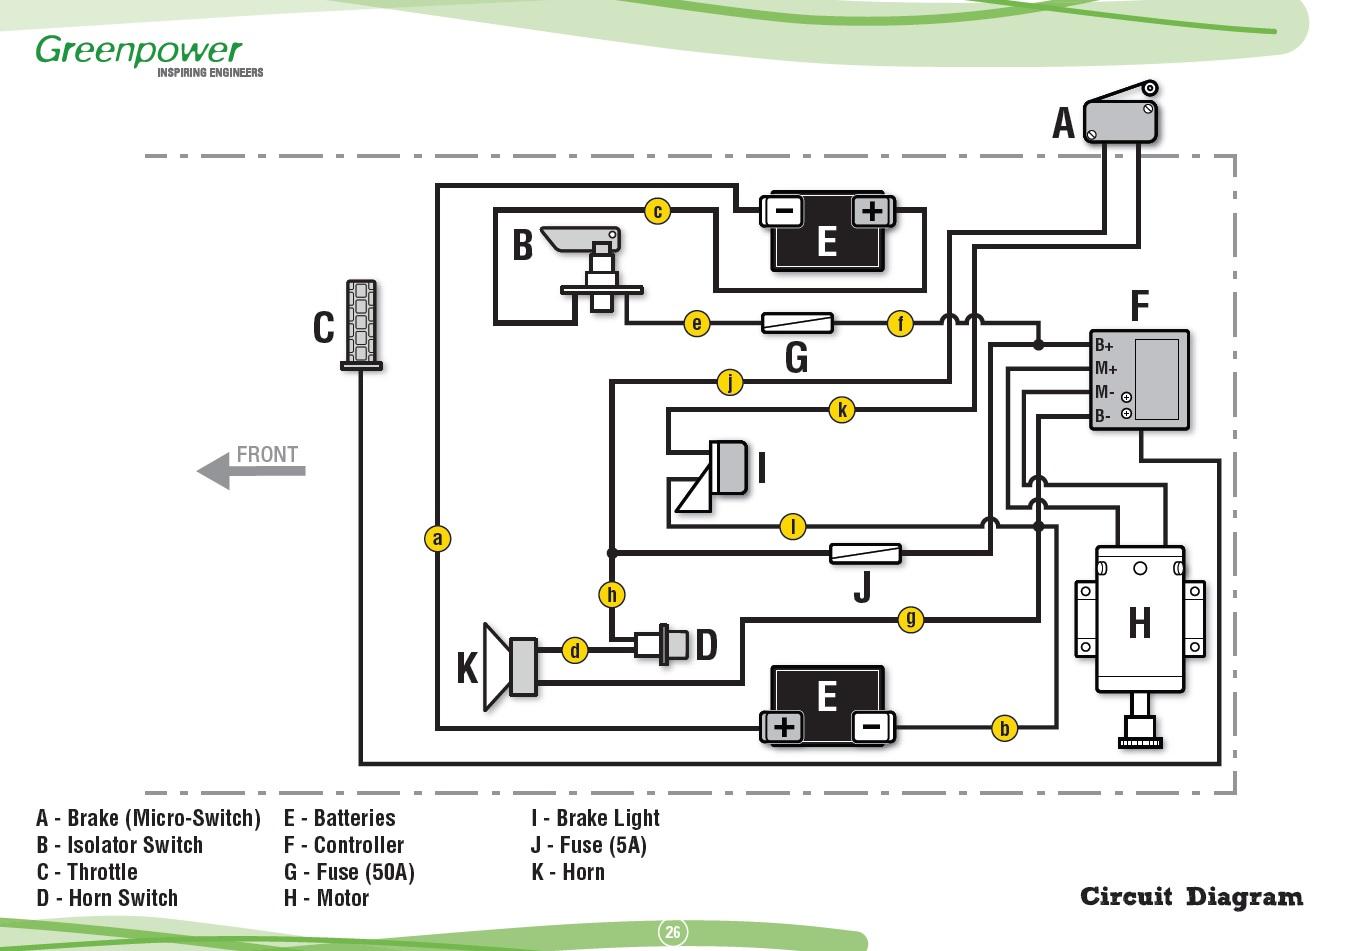 Basic Wiring Diagram For Race Car